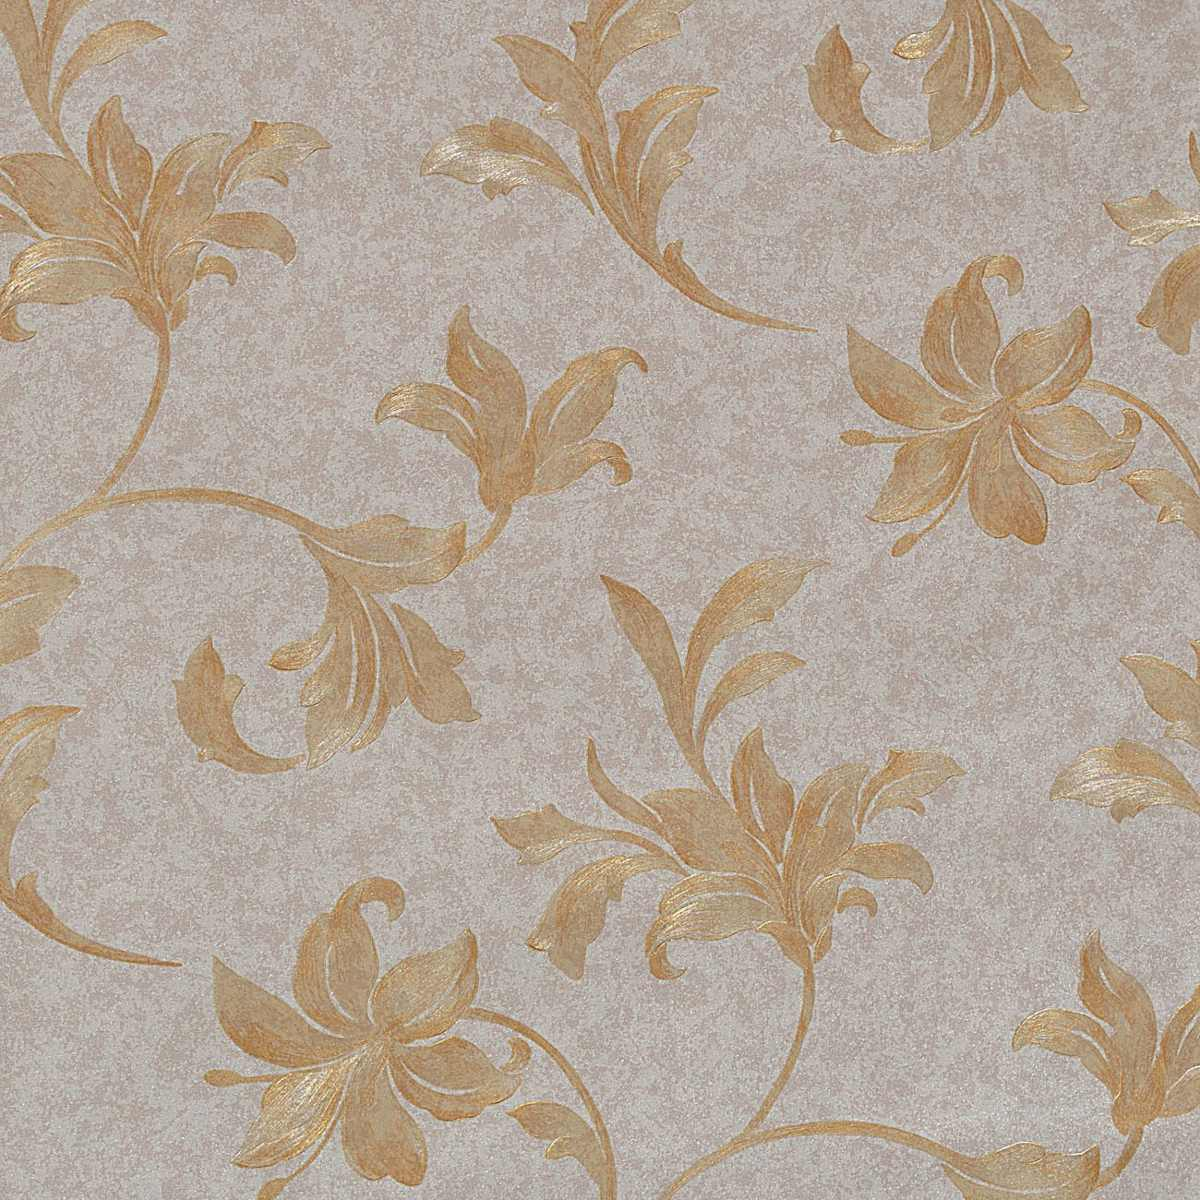 Papel de parede importado texturizado ramos flores laranja - Papel para paredes ...